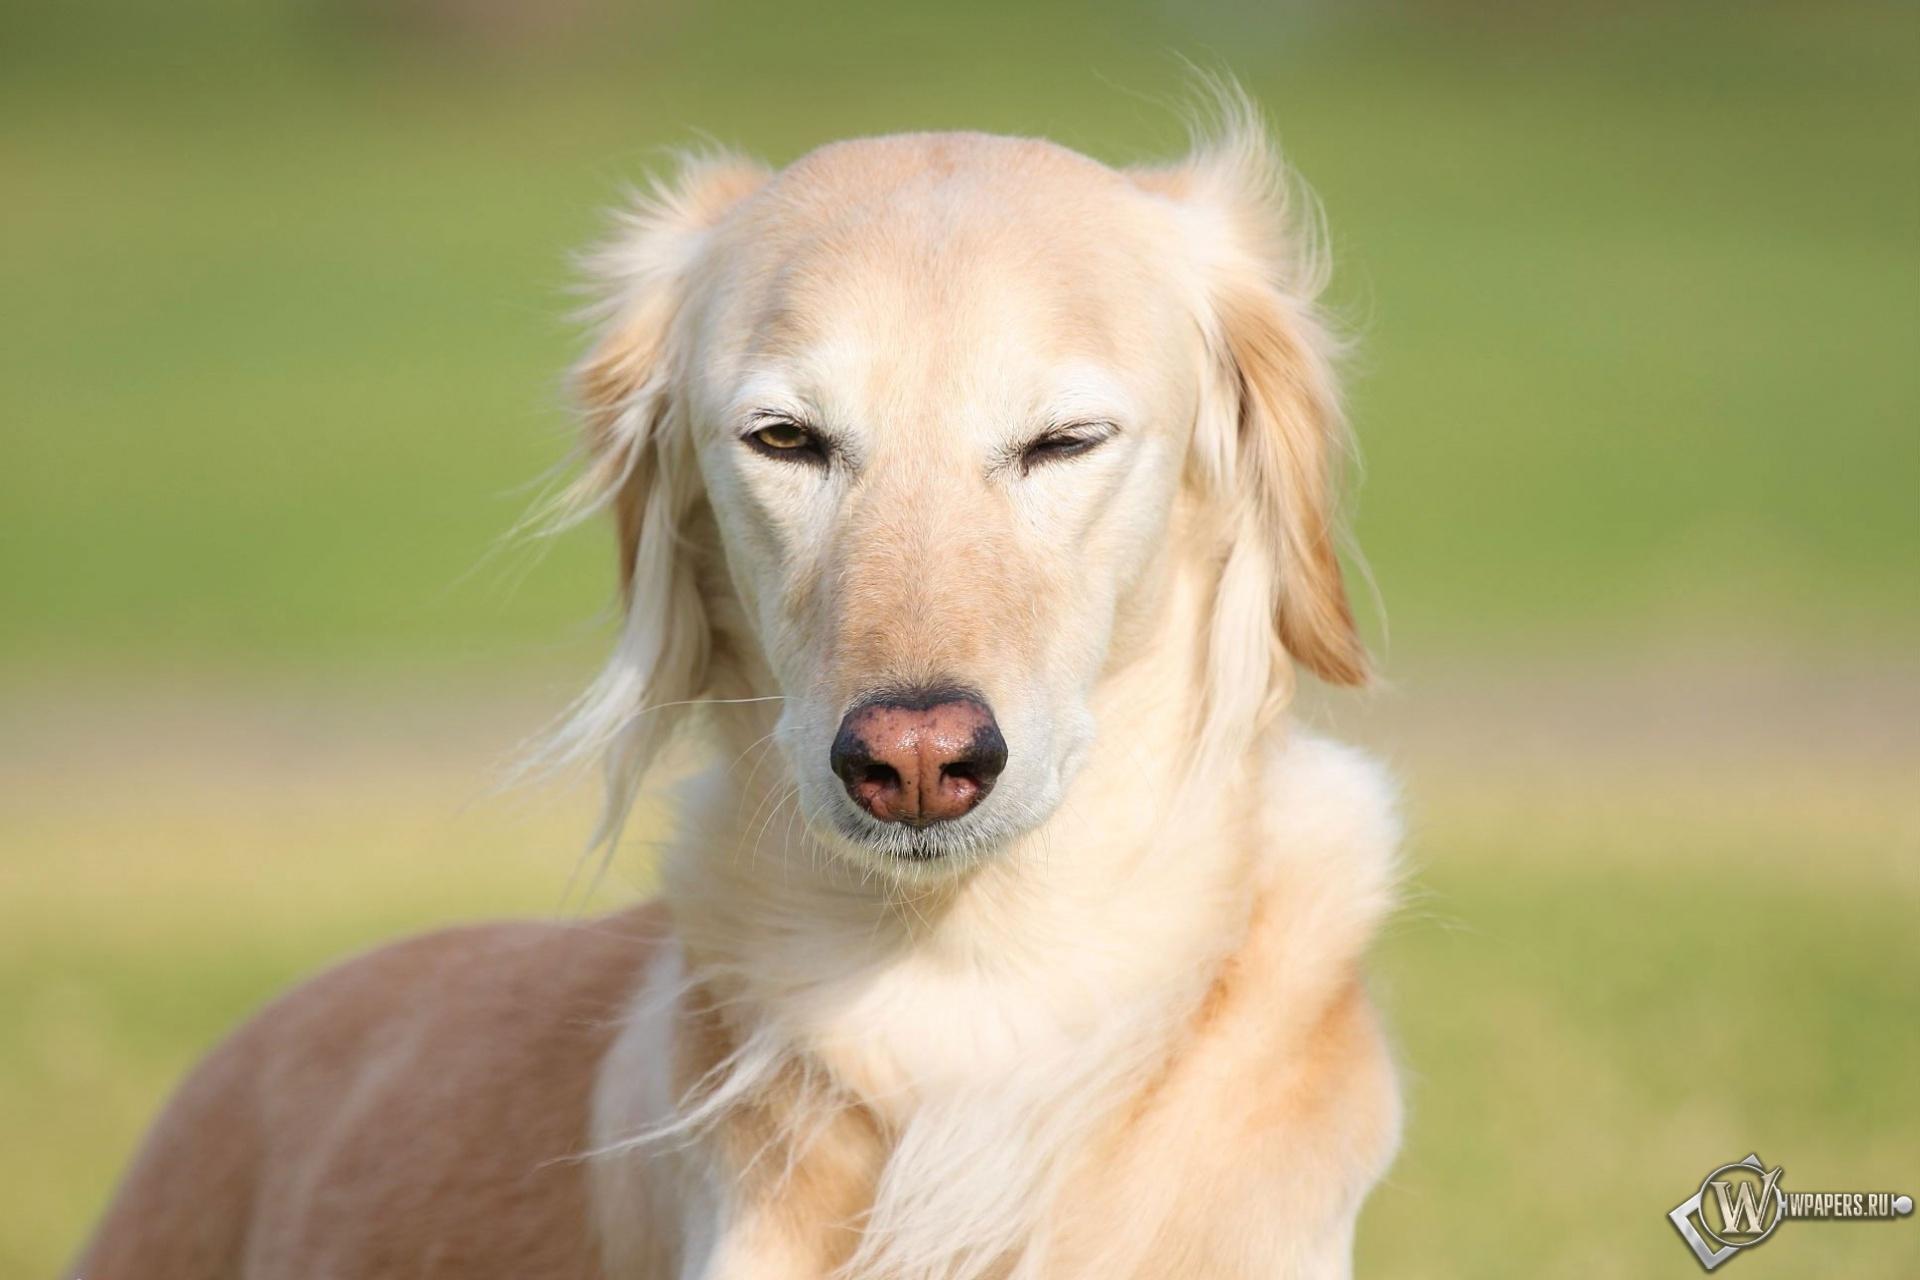 Довольная собака 1920x1280